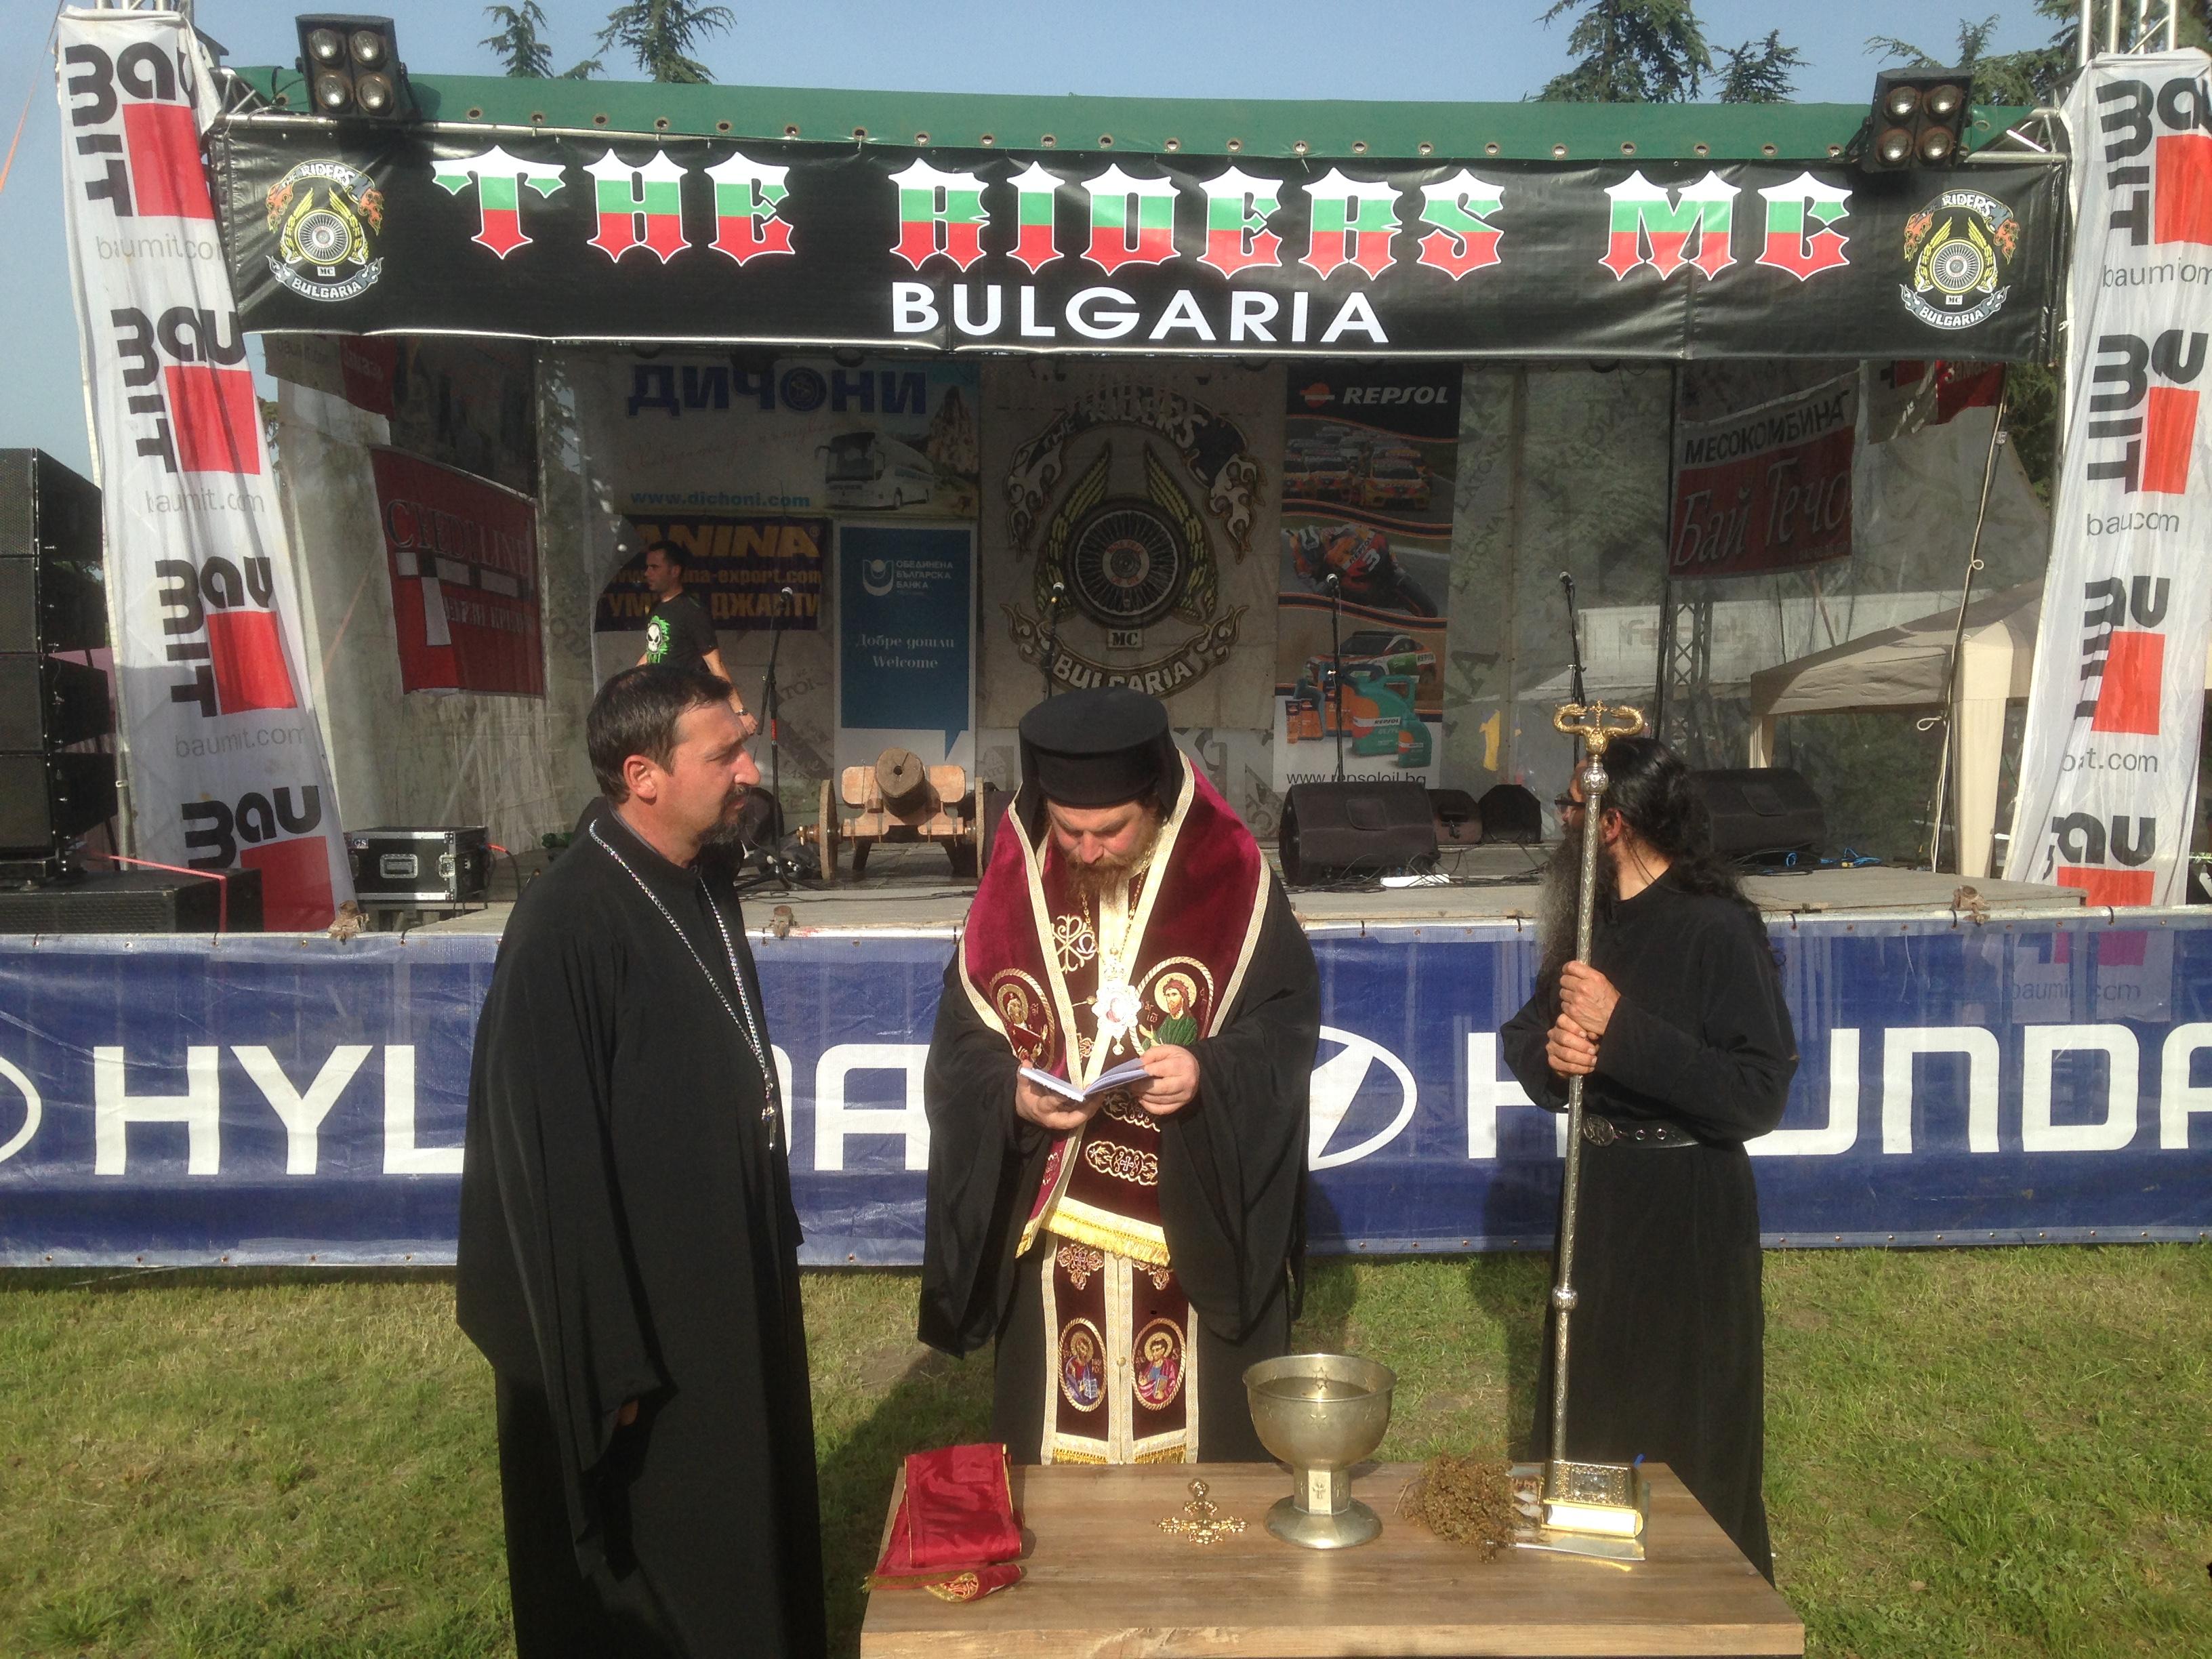 Bishop_Ierotey_Ksakovof_Agathopol-Bishop-of-Bulgarian-Orthodox-Church_Moto-rocker-feast-Bakadjika-2017